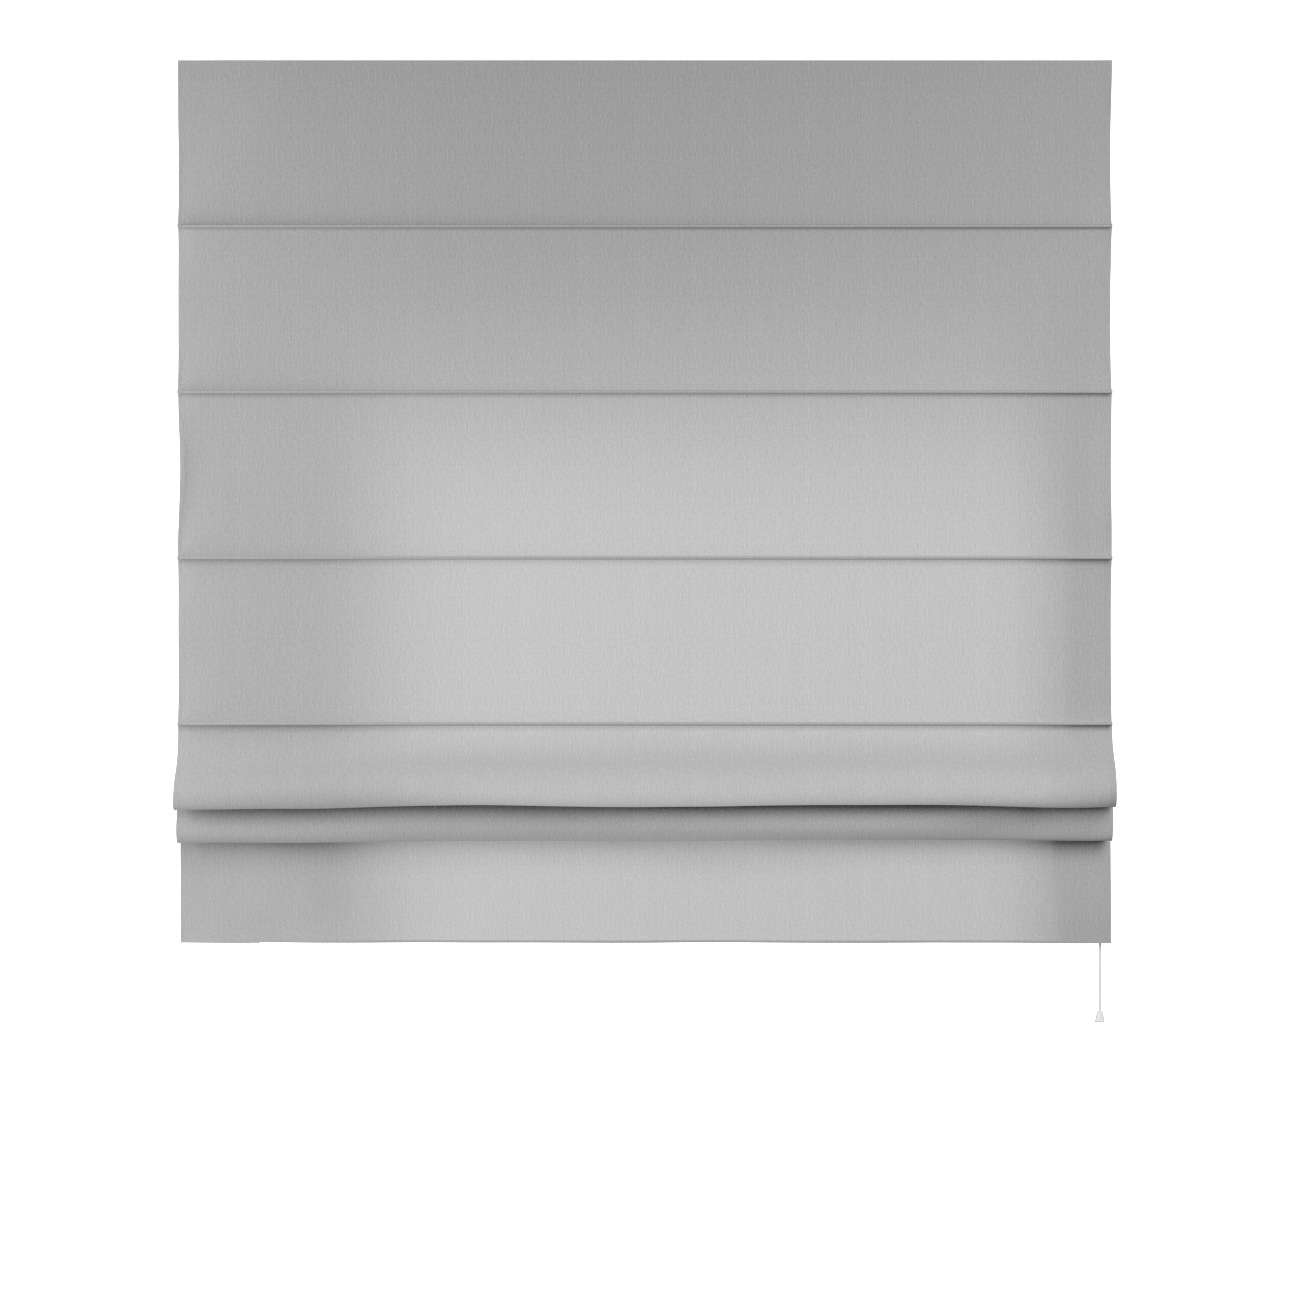 Romanetės Padva 80 x 170 cm (plotis x ilgis) kolekcijoje Chenille, audinys: 702-23